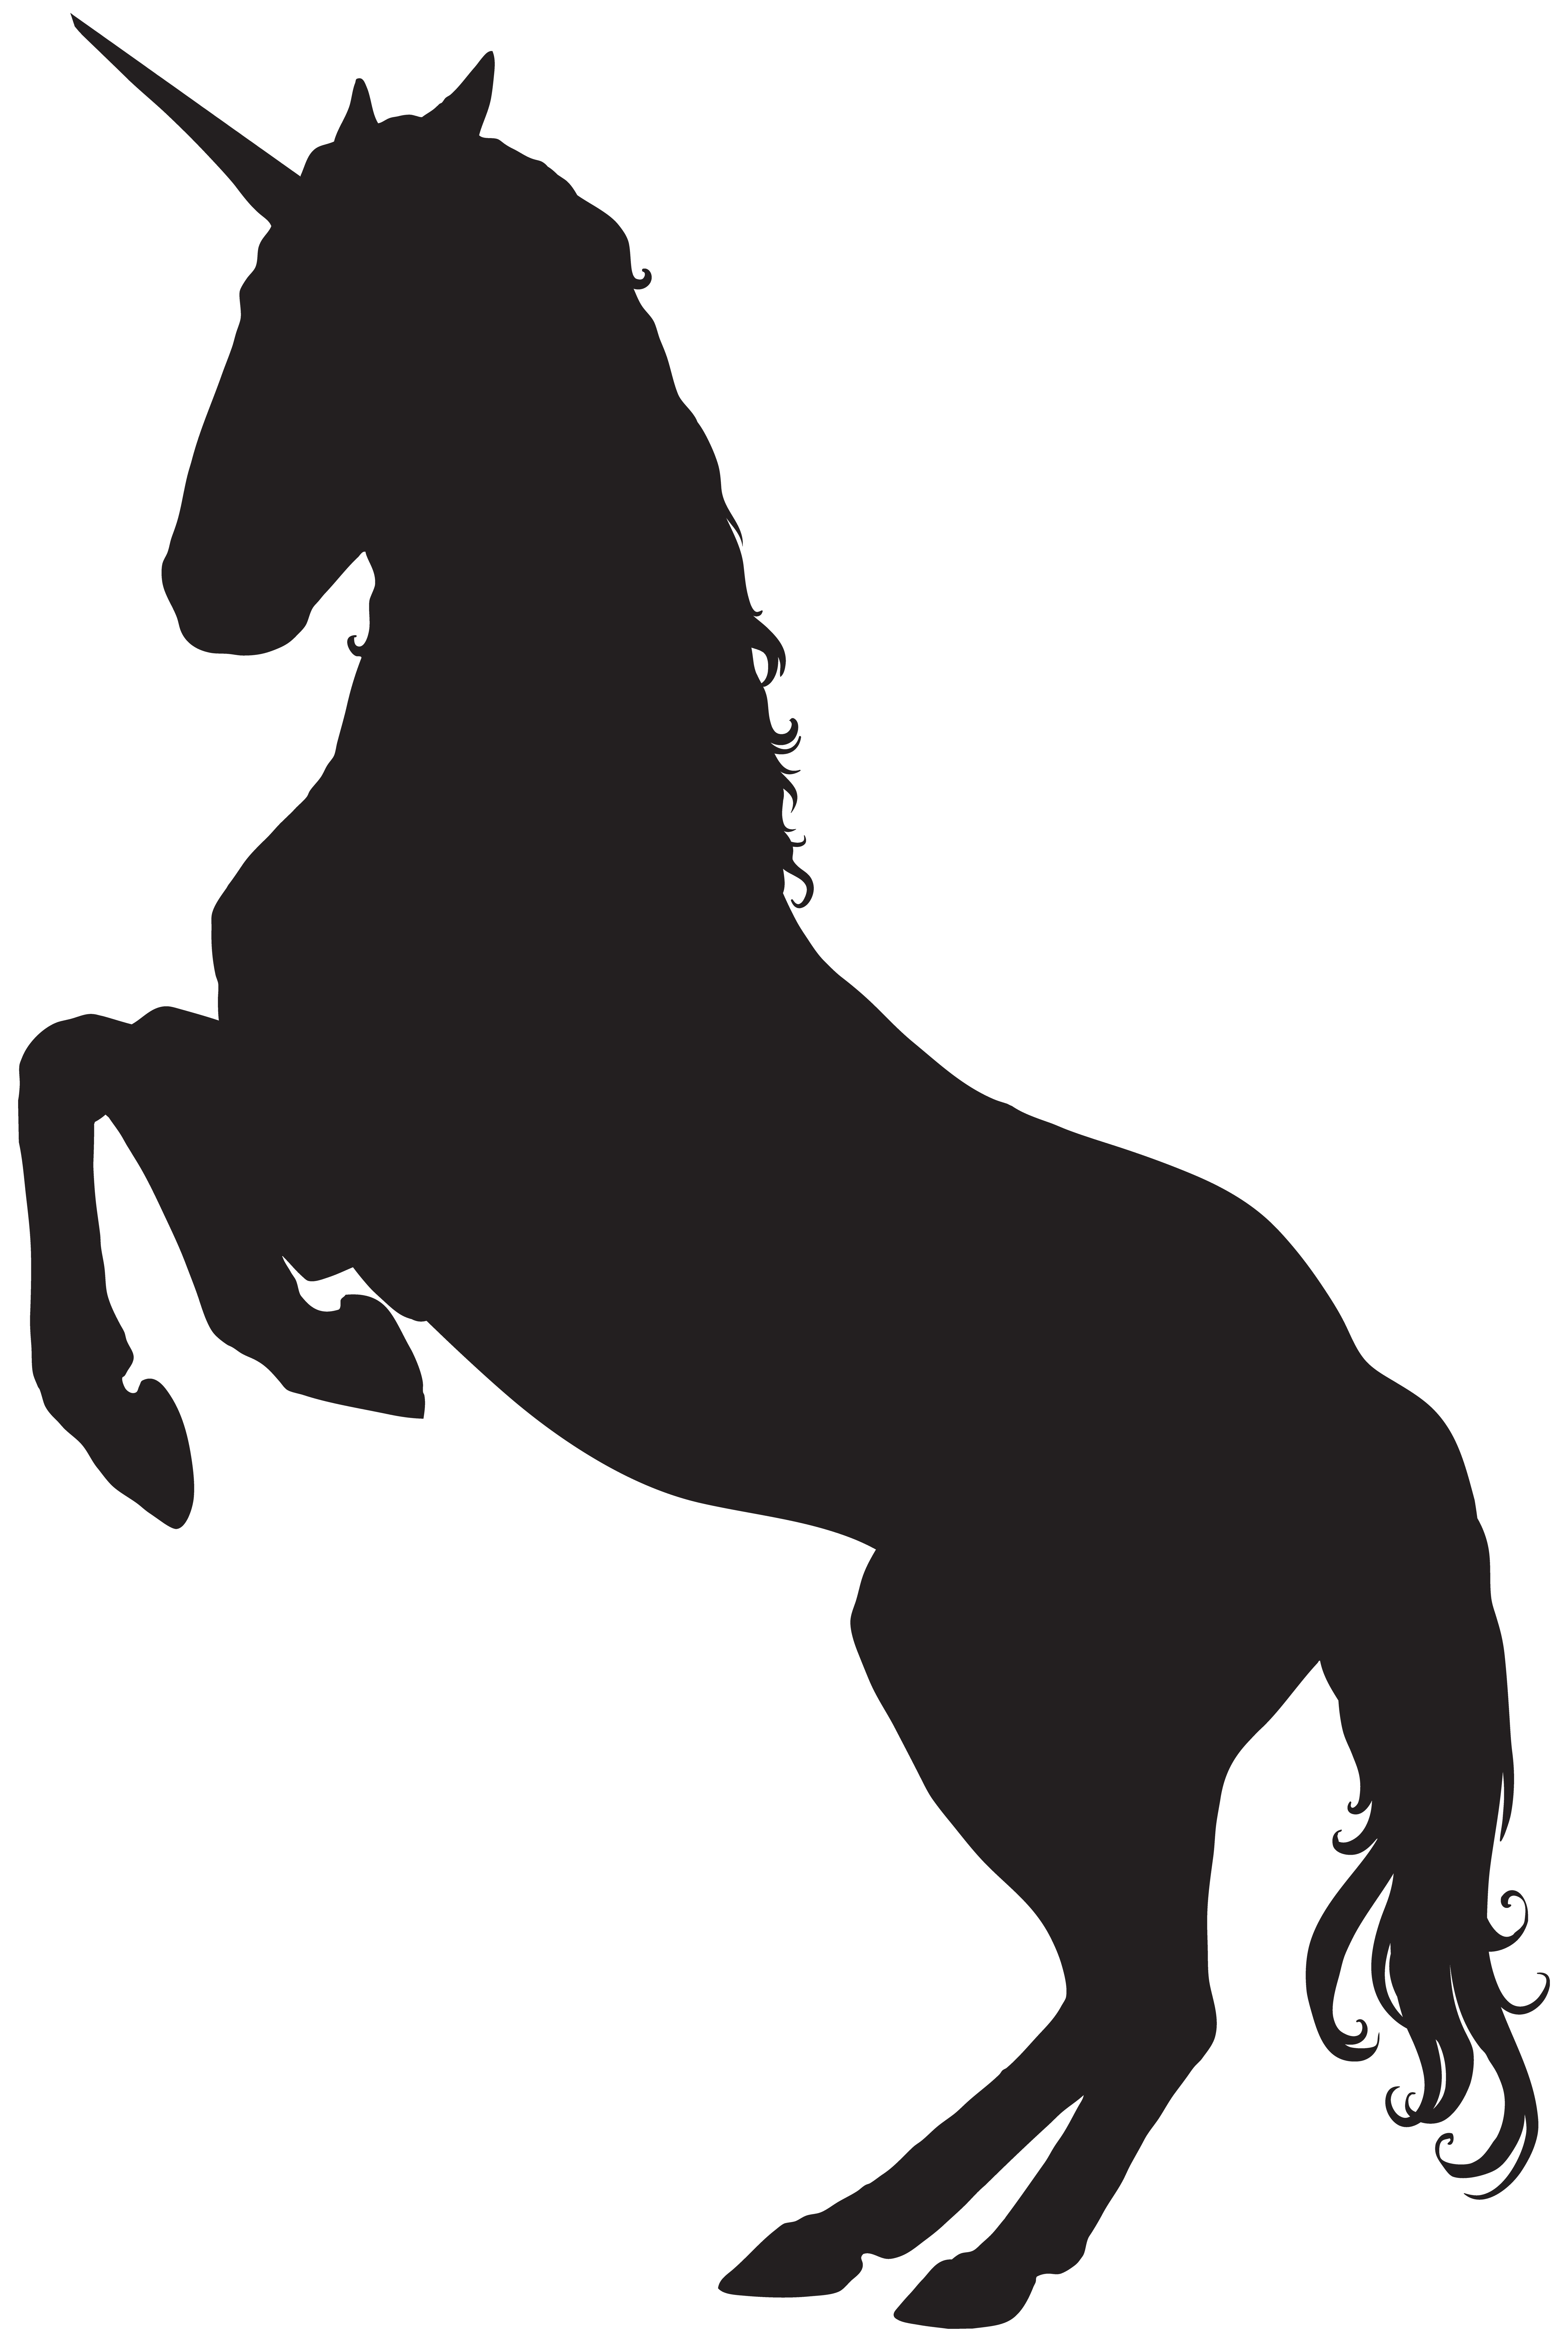 Taste clipart sensitivity. Unicorn silhouette png clip